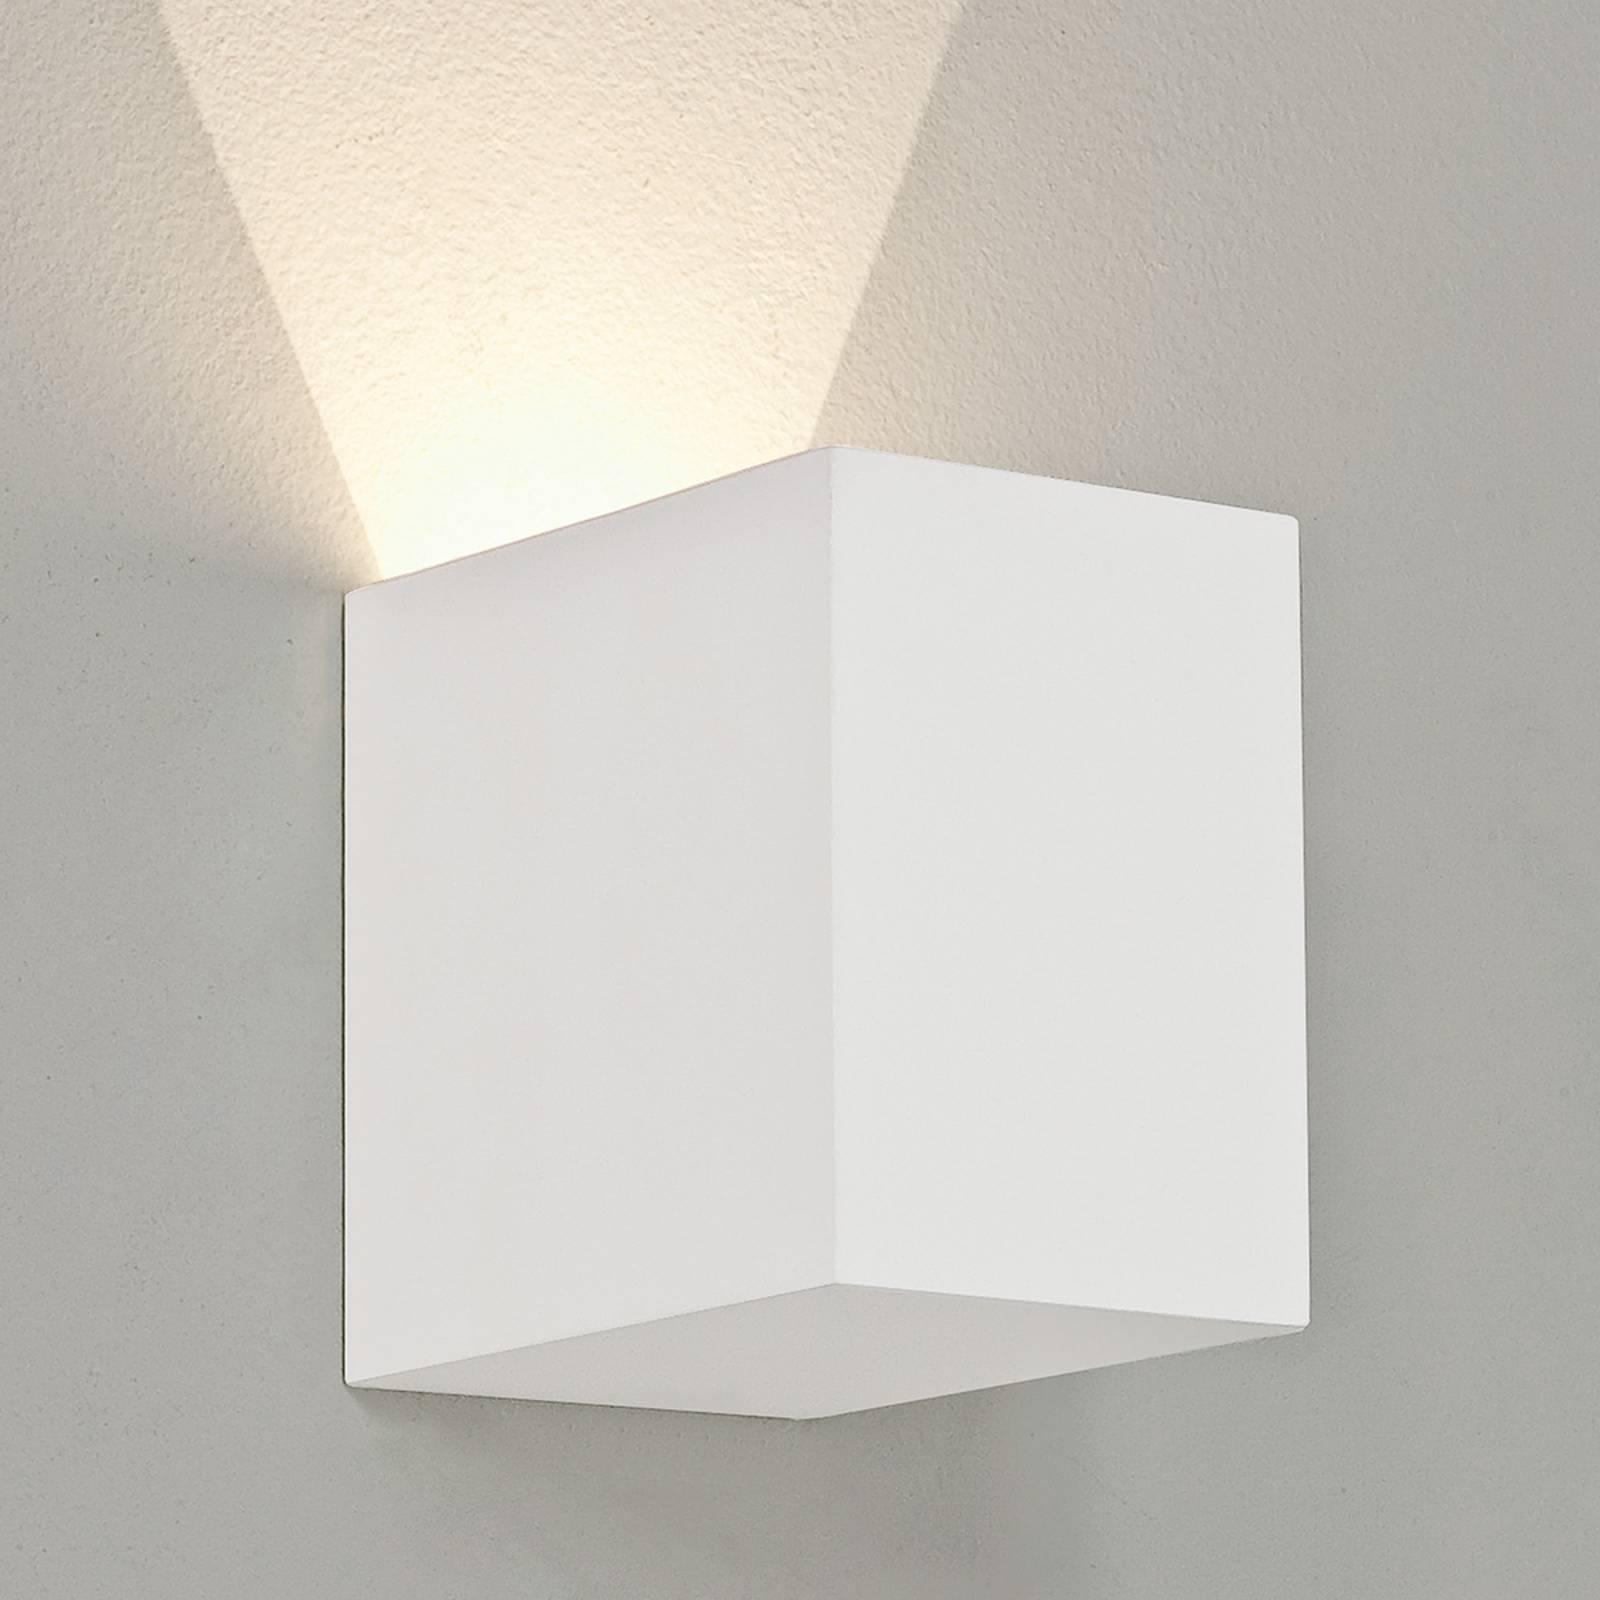 Astro Parma 100 applique LED di gesso, 2.700 K